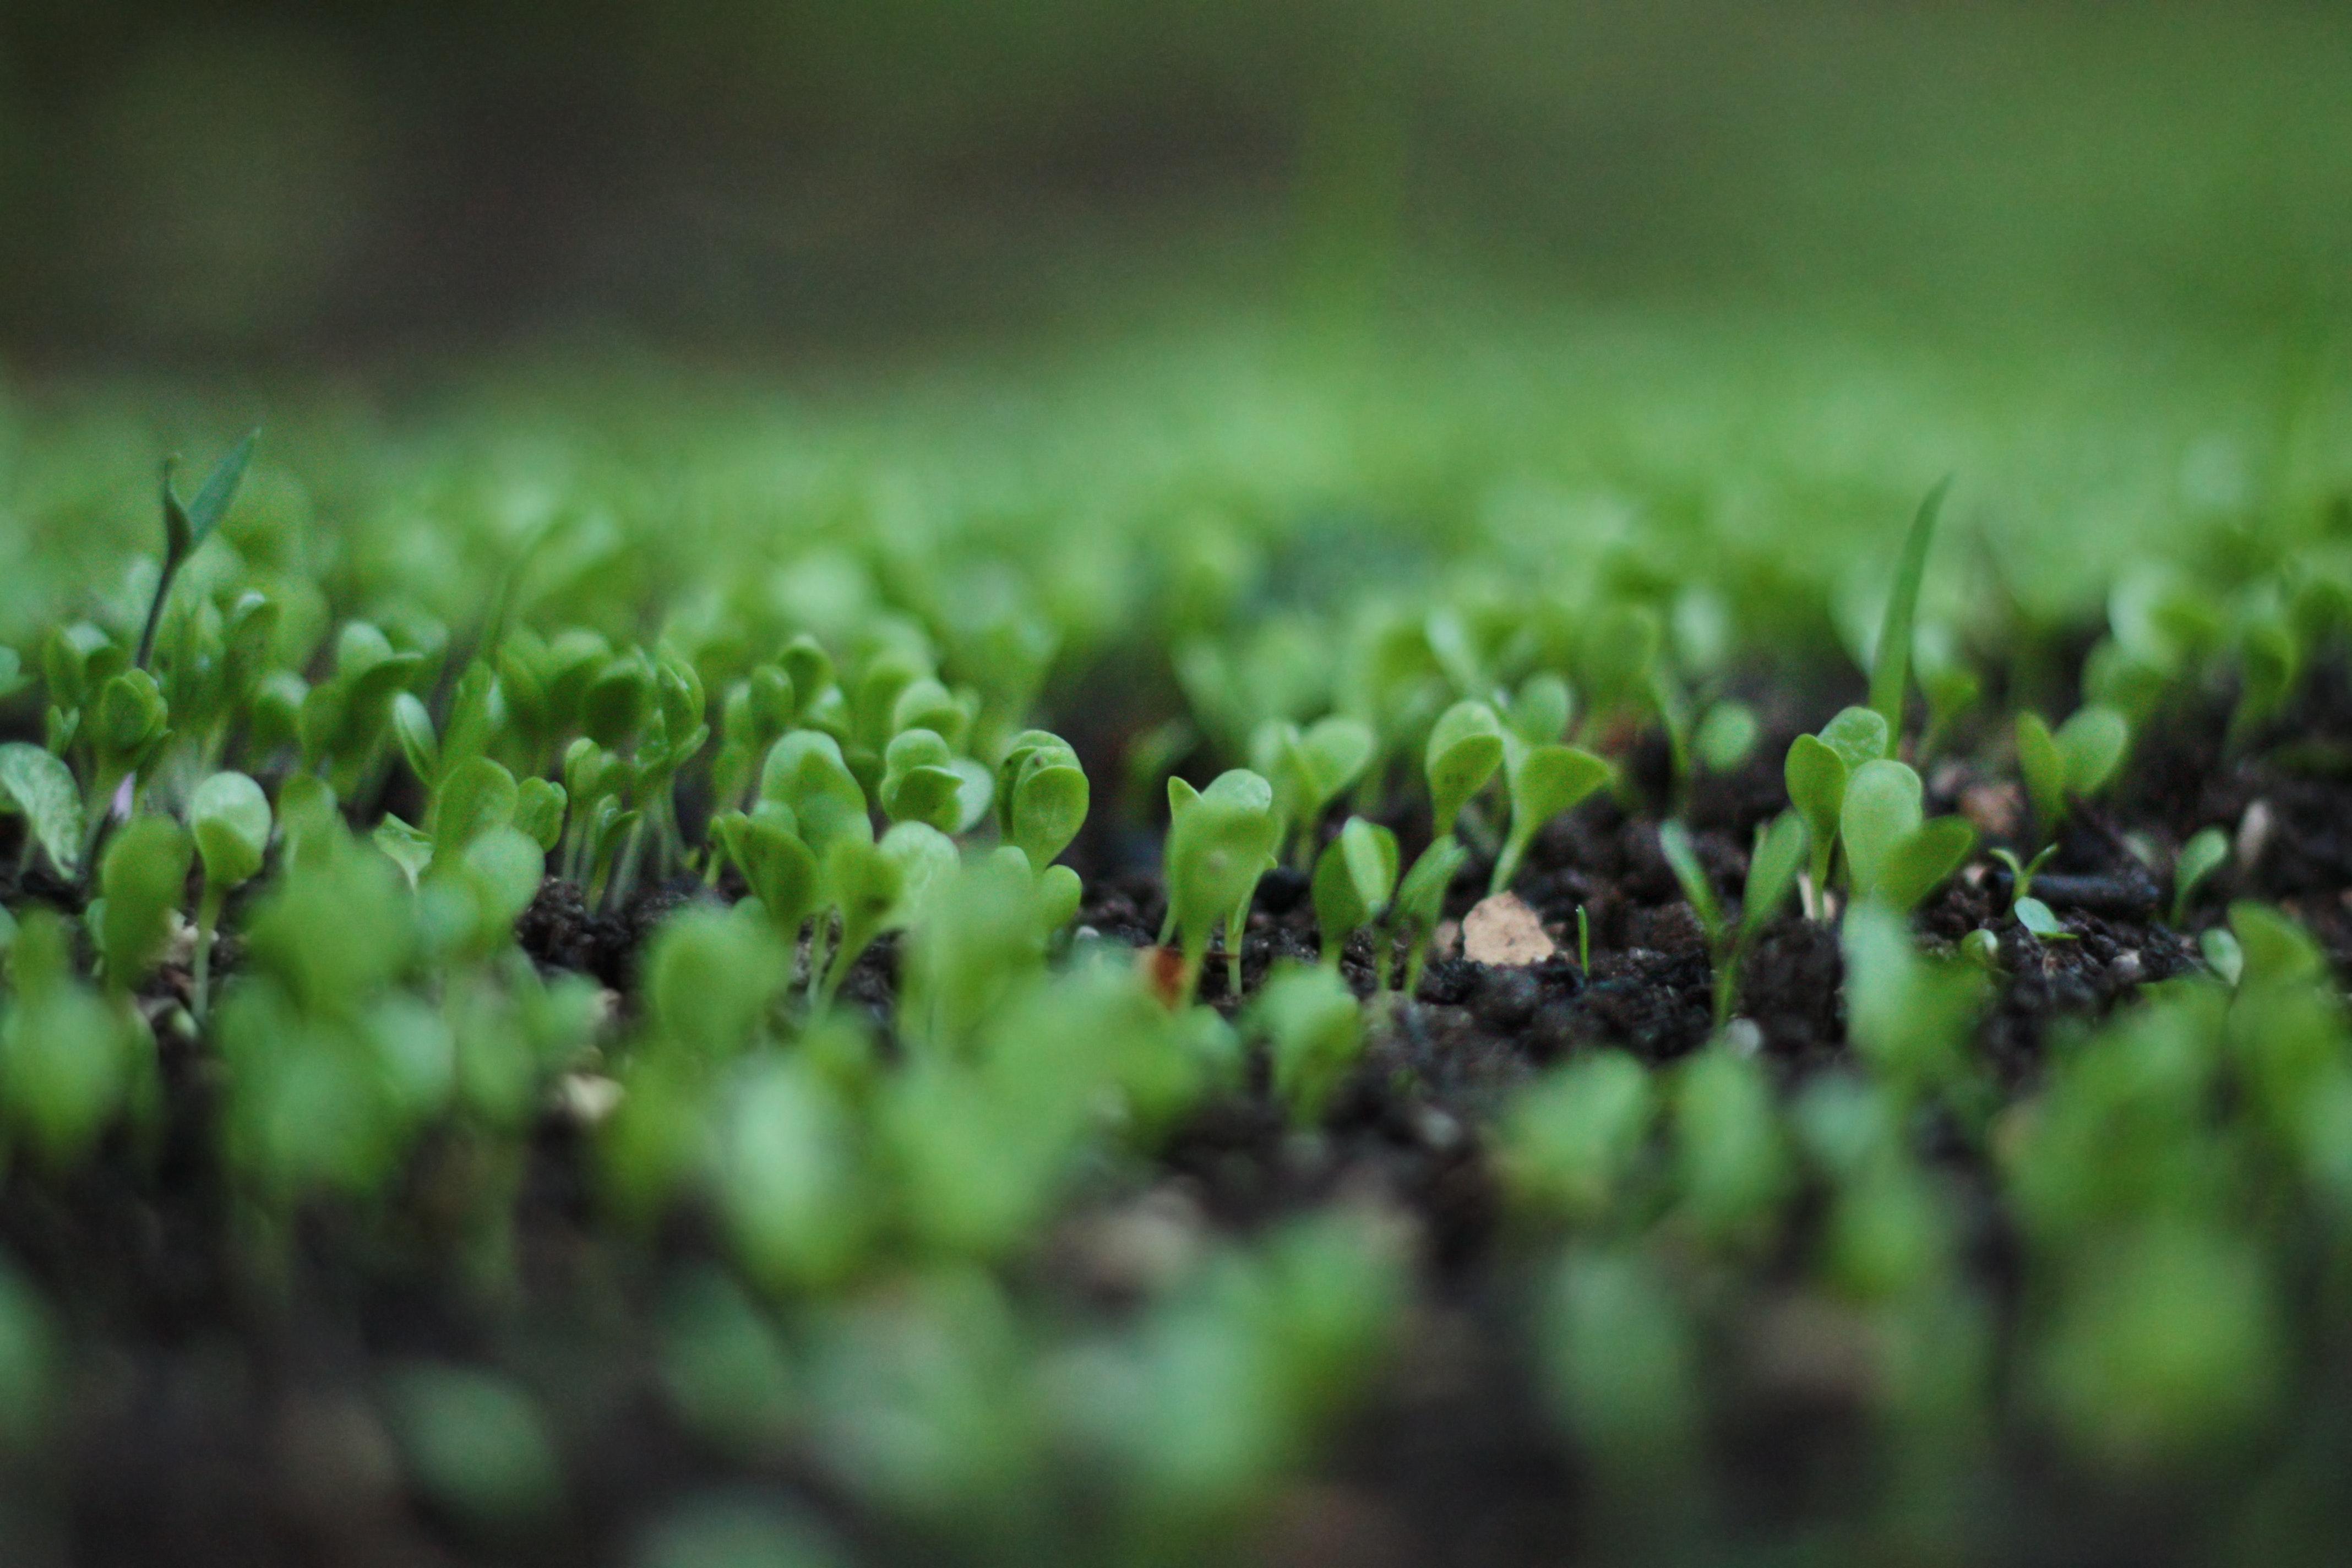 Firma pěstuje salát s využitím minima vody, aby nakrmila hladové